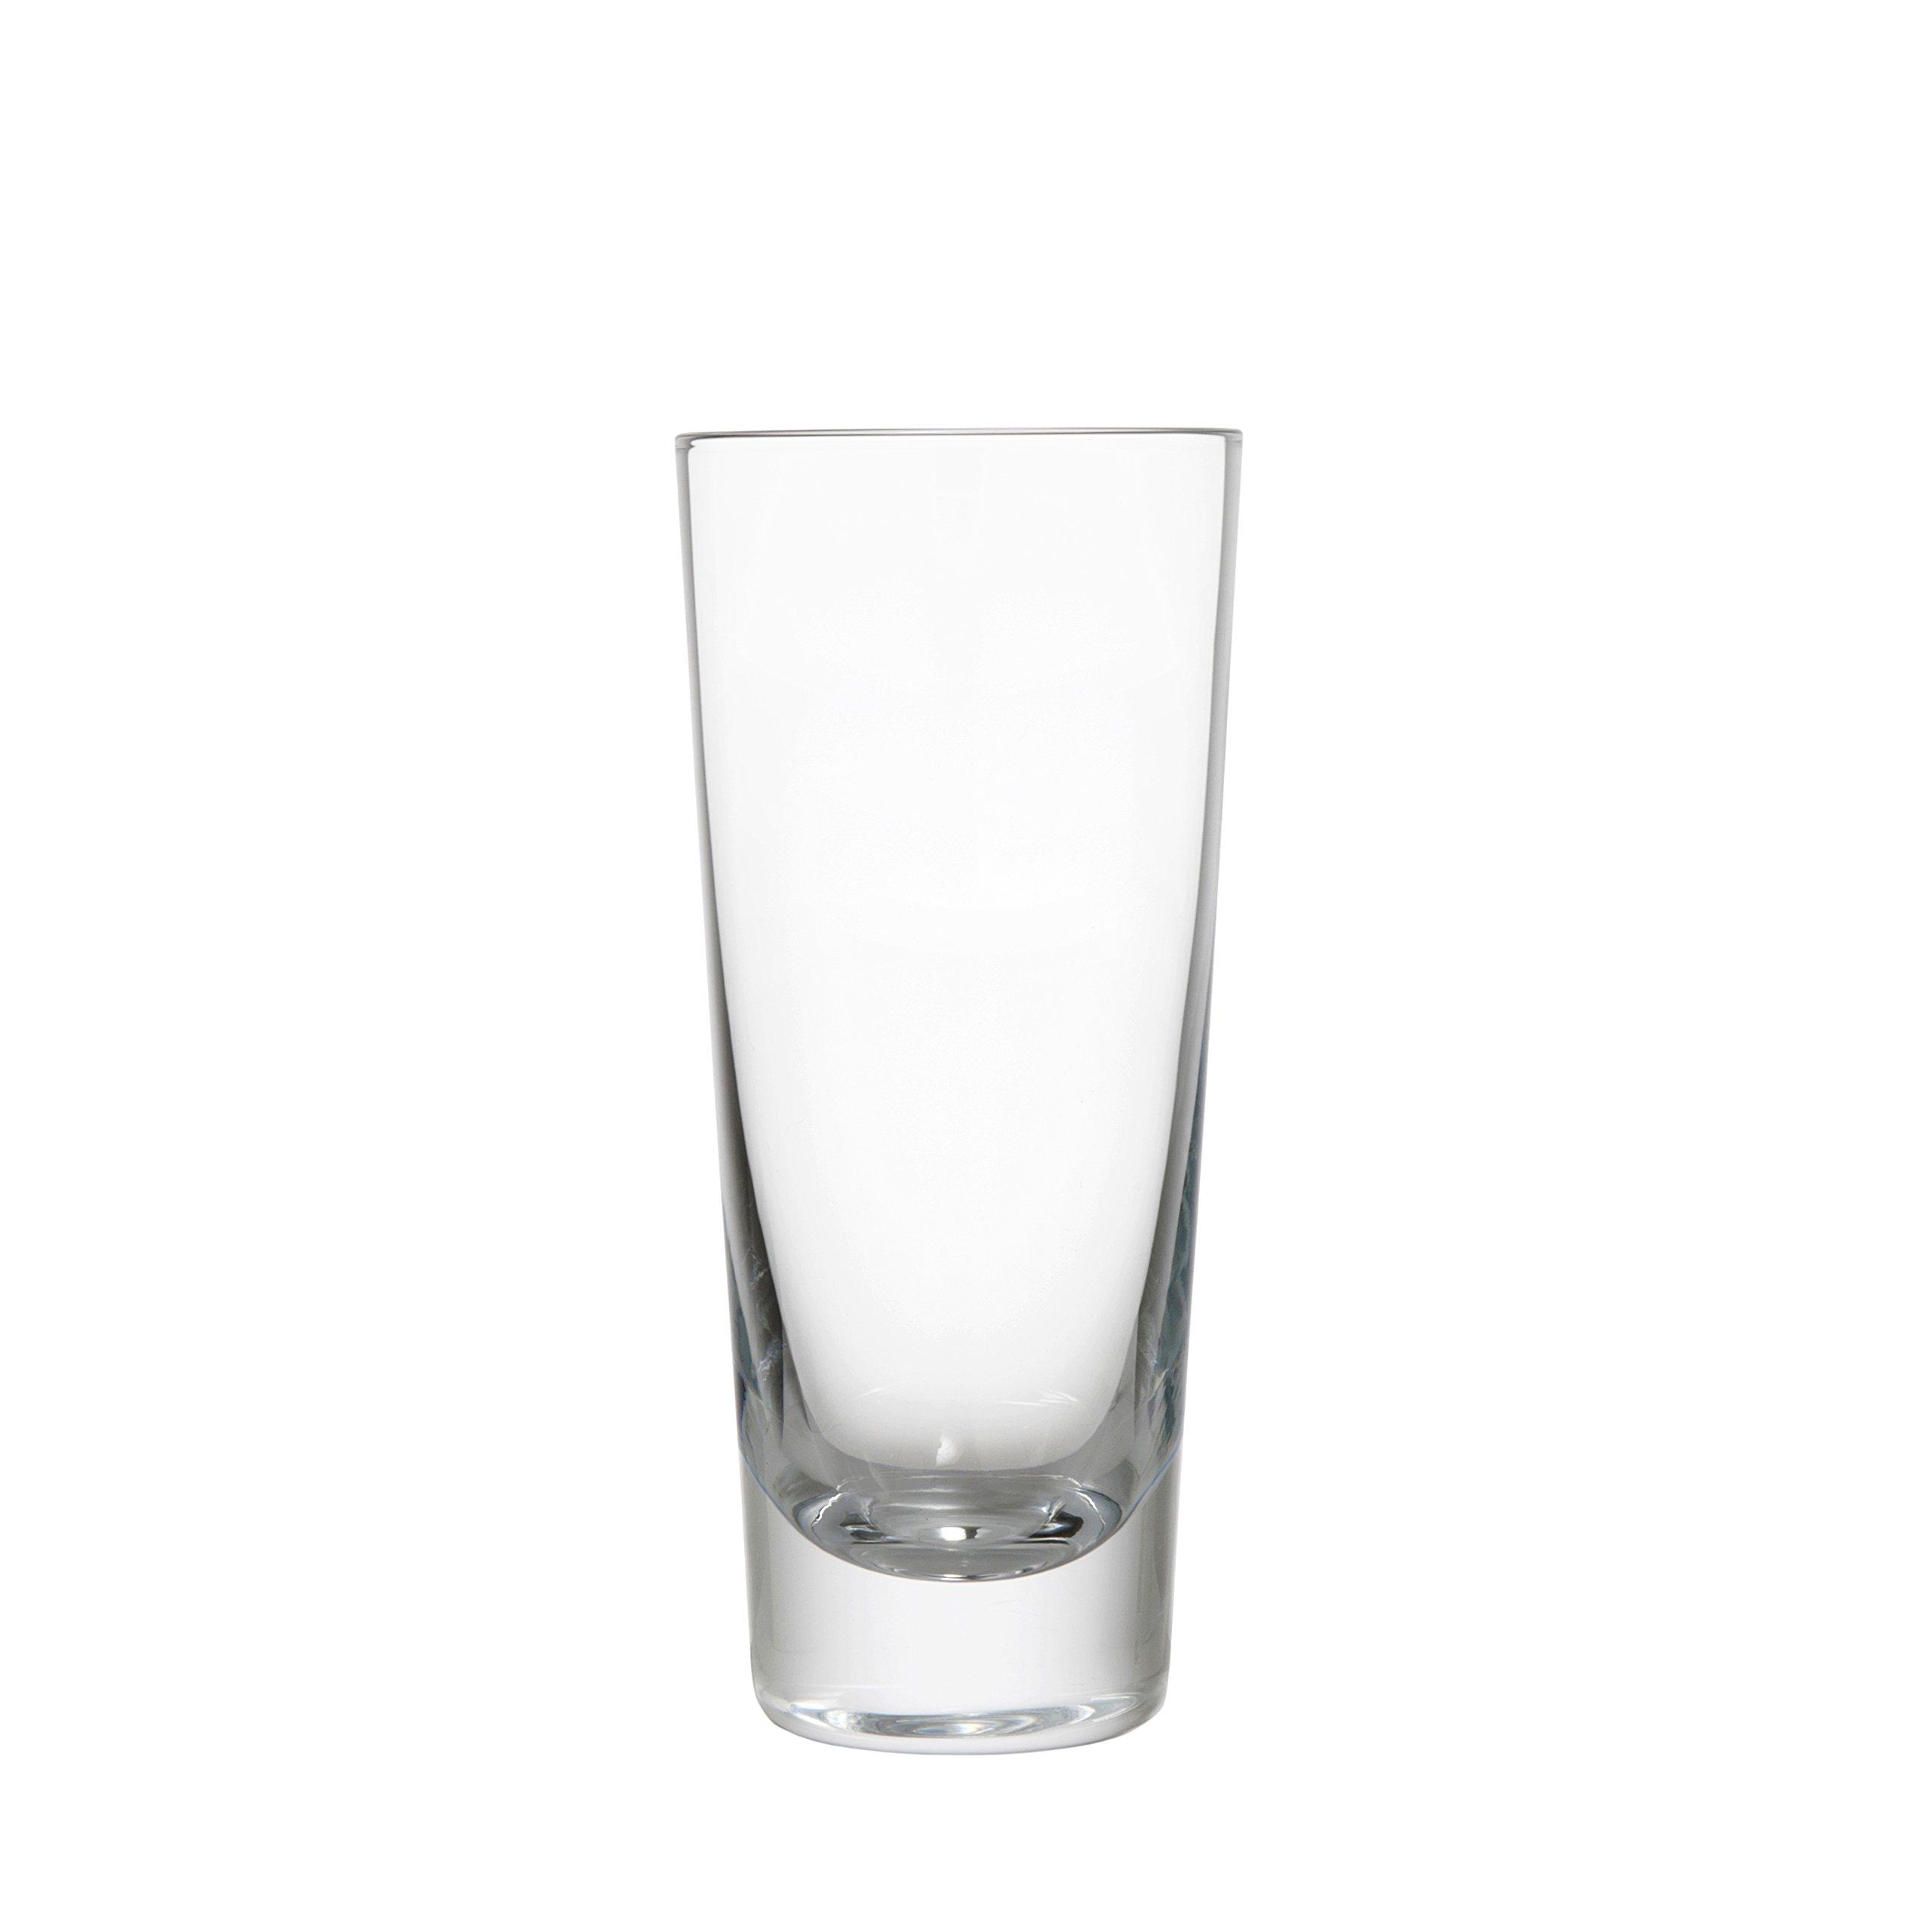 Schott Zwiesel Tritan Crystal Glass Tossa Barware Collection Beer Tumbler/Highball Glass, 8.3-Ounce, Set of 6